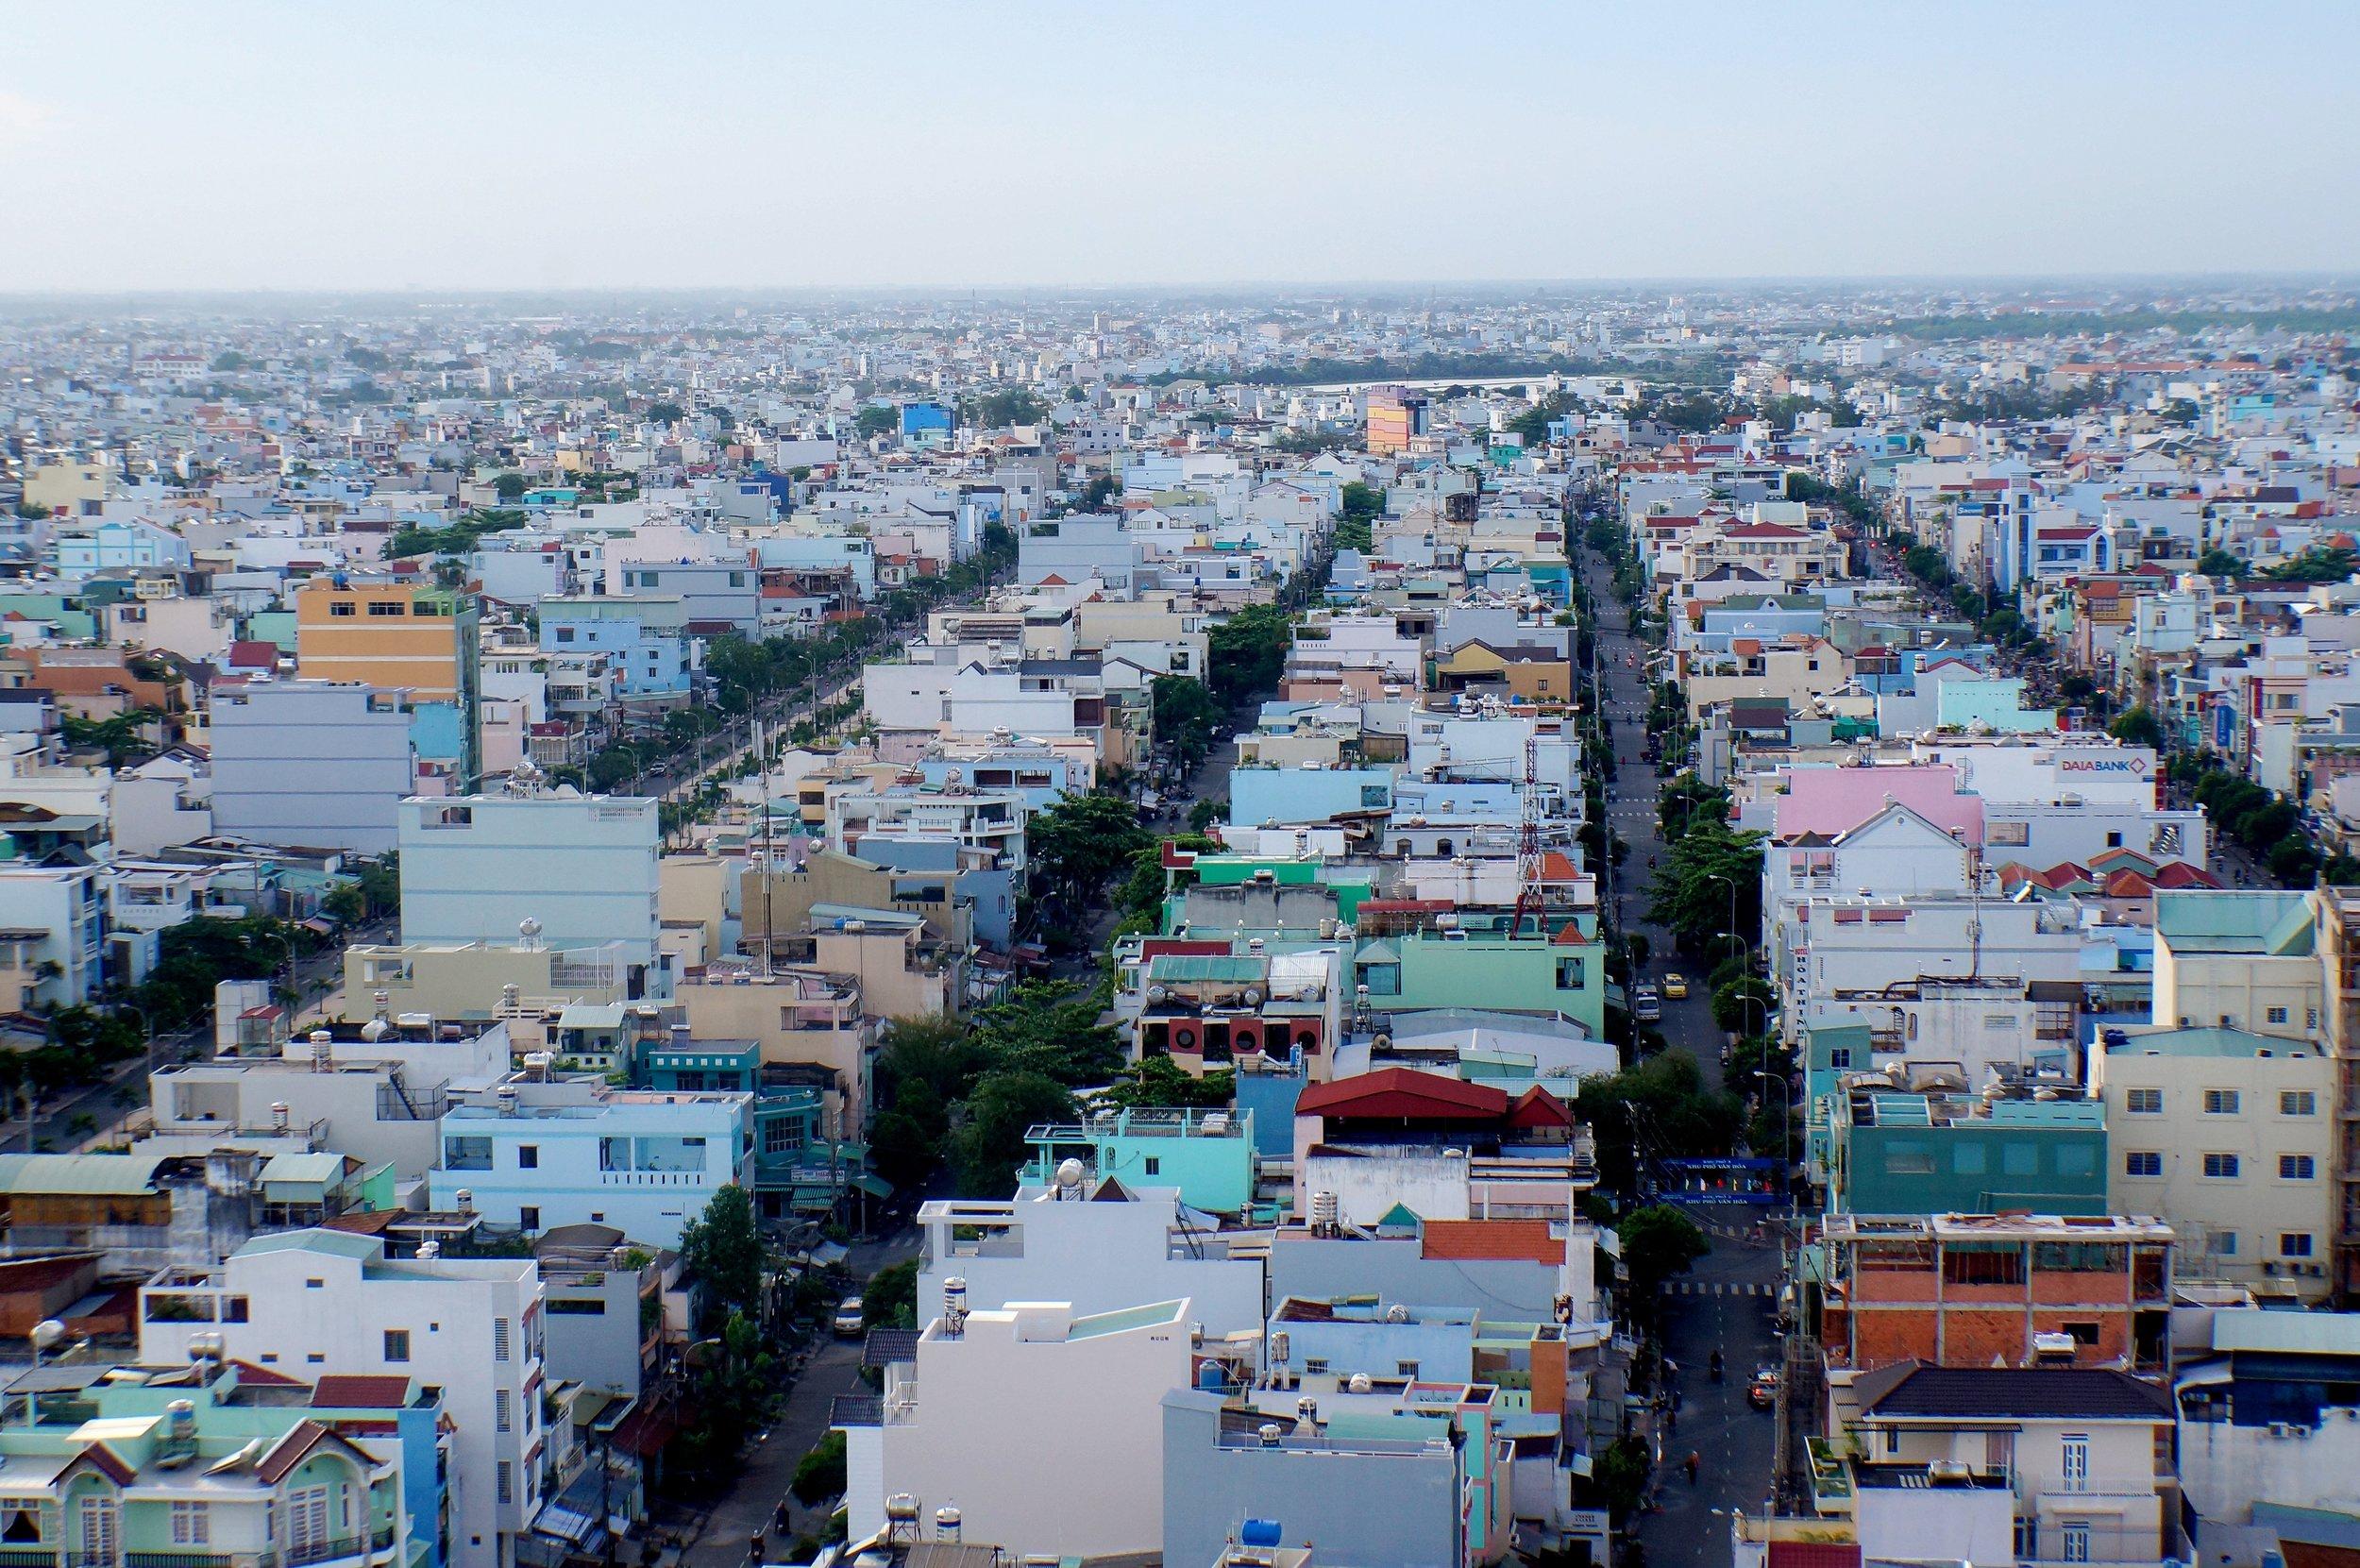 3 Week in Vietnam - Saigon/Ho Chi Minh City